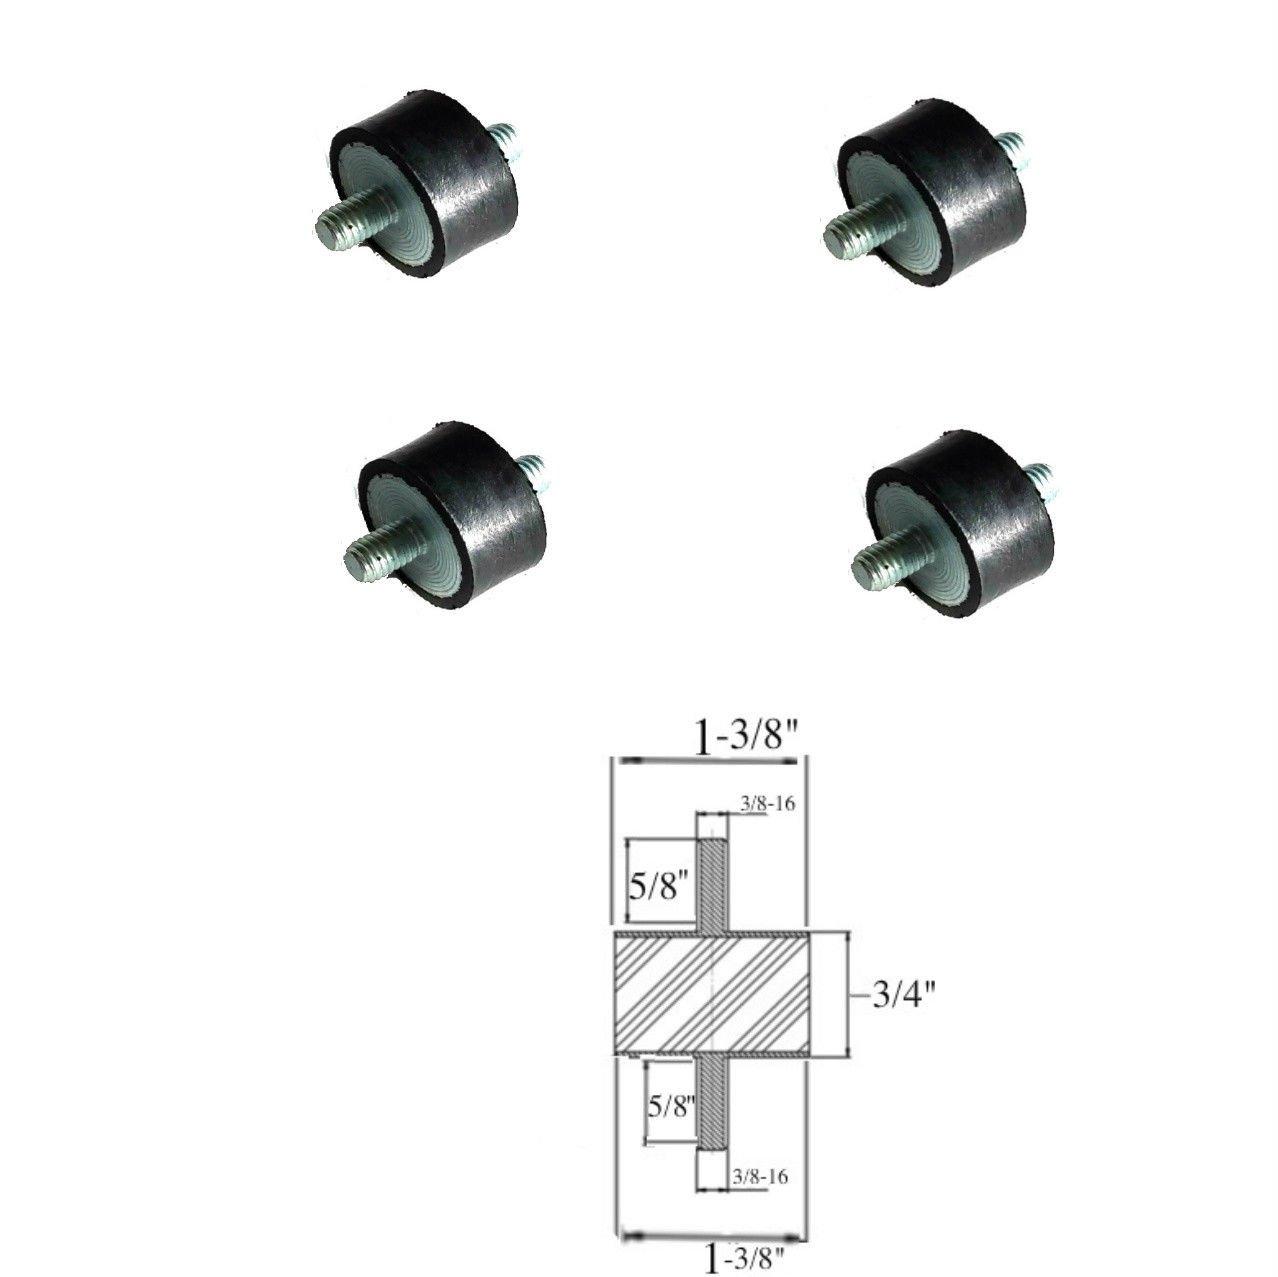 Lot of (4) Rubber Vibration Isolator Mounts (1-3/8'' Dia x 3/4 Thk) 3/8-16 x 5/8 Long Studs